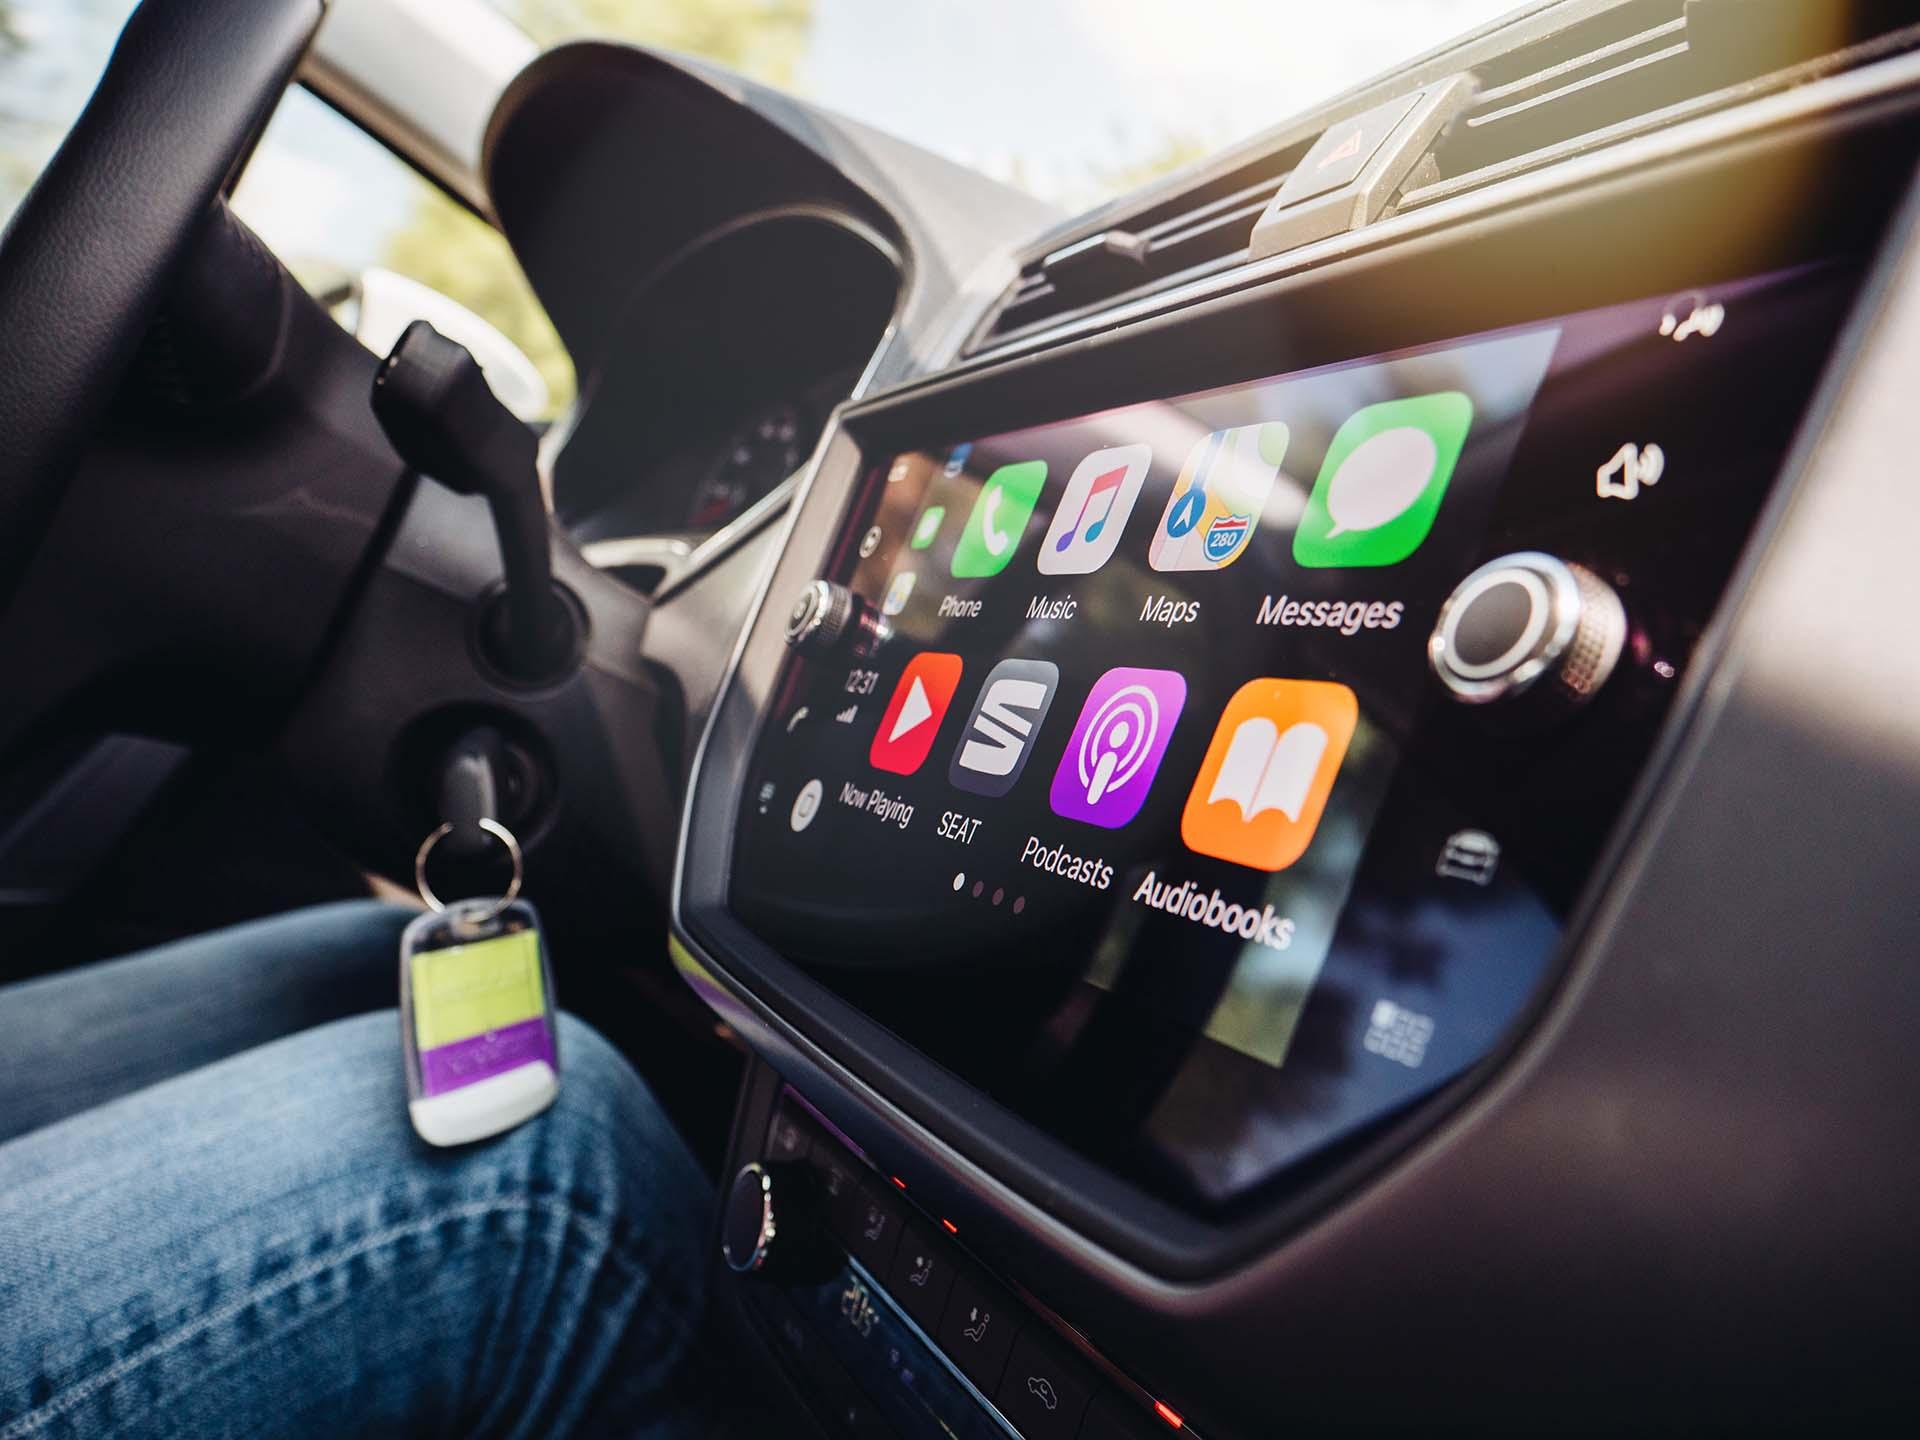 Apple CarPlay, MirrorLink, Android Auto : quelles solutions pour connecter son smartphone à sa voiture ?